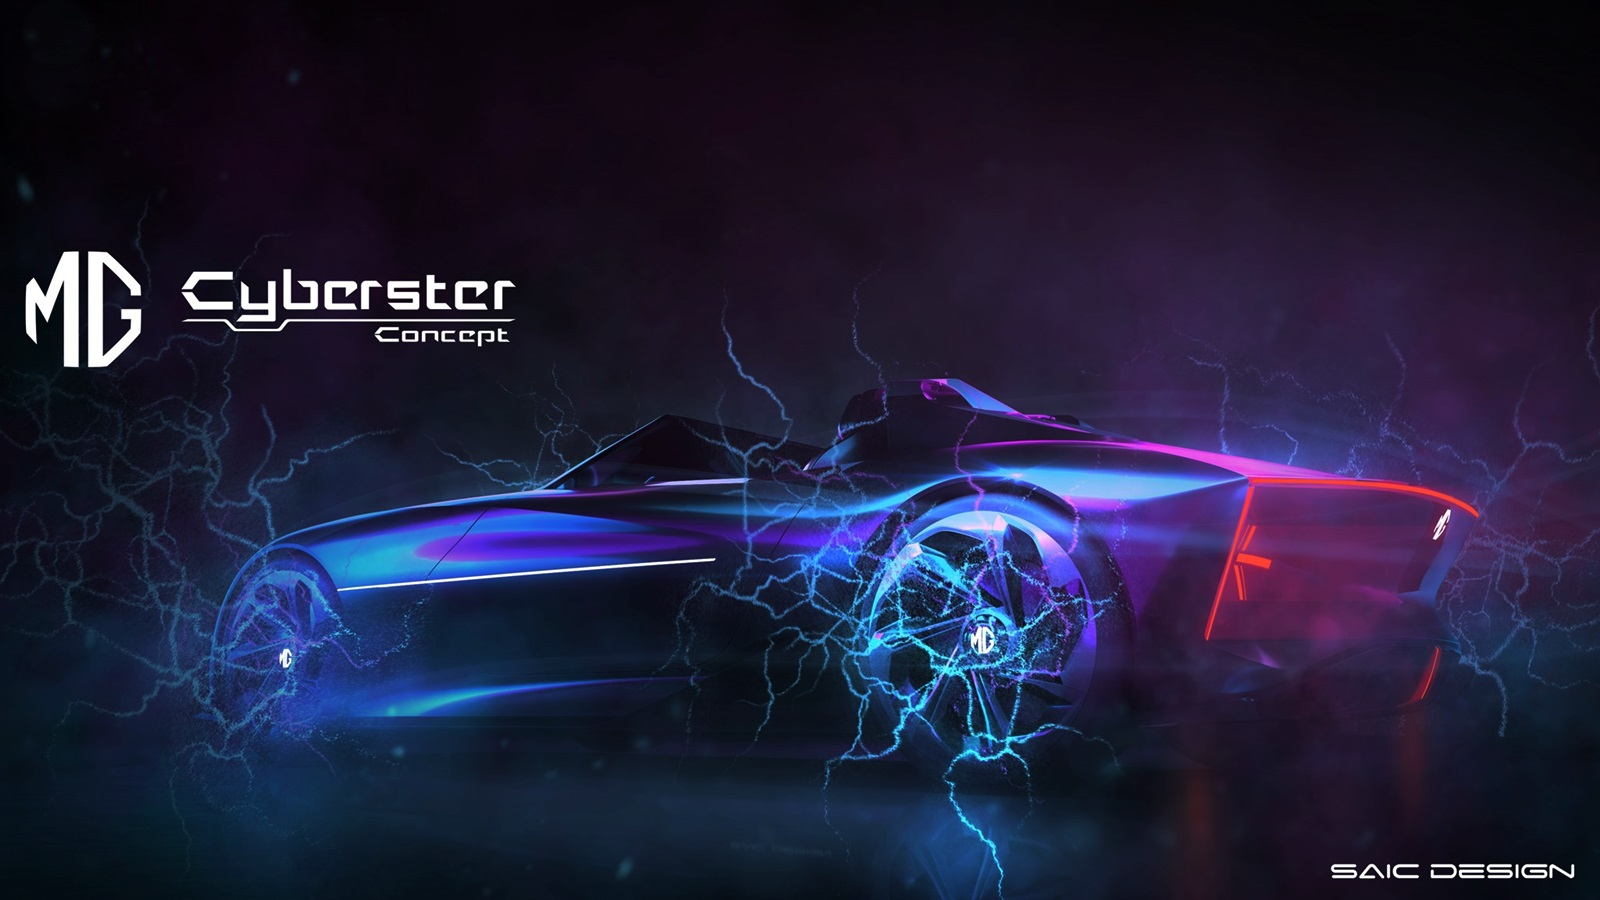 Mg Cyberster (1)